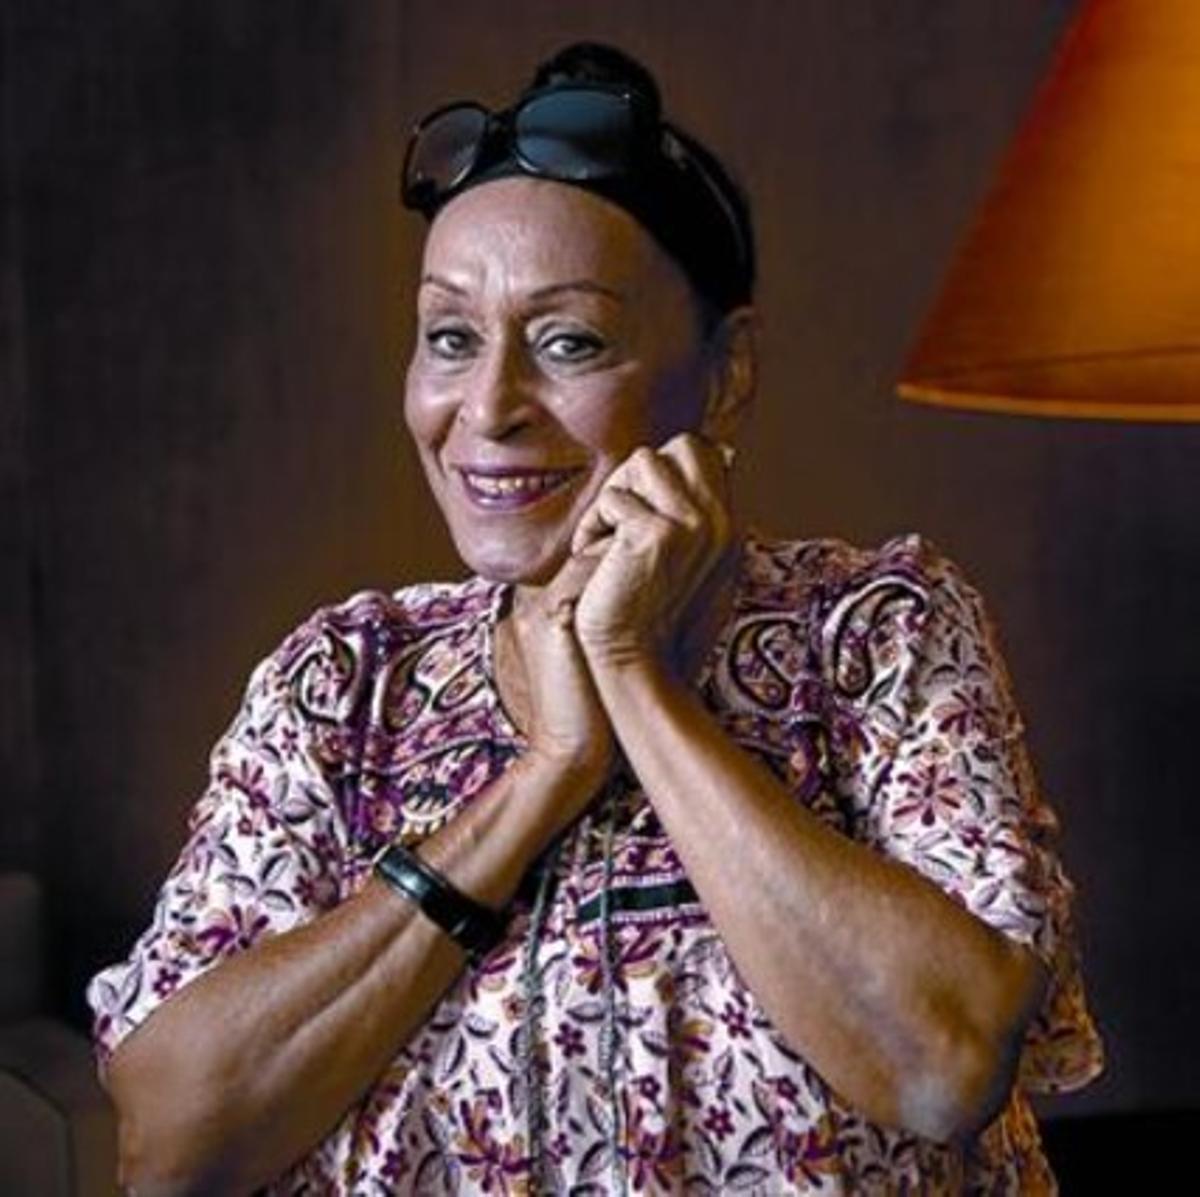 La cantante cubana Omara Portuondo, que hoy actúa en Tarragona con Buena Vista Social Club.